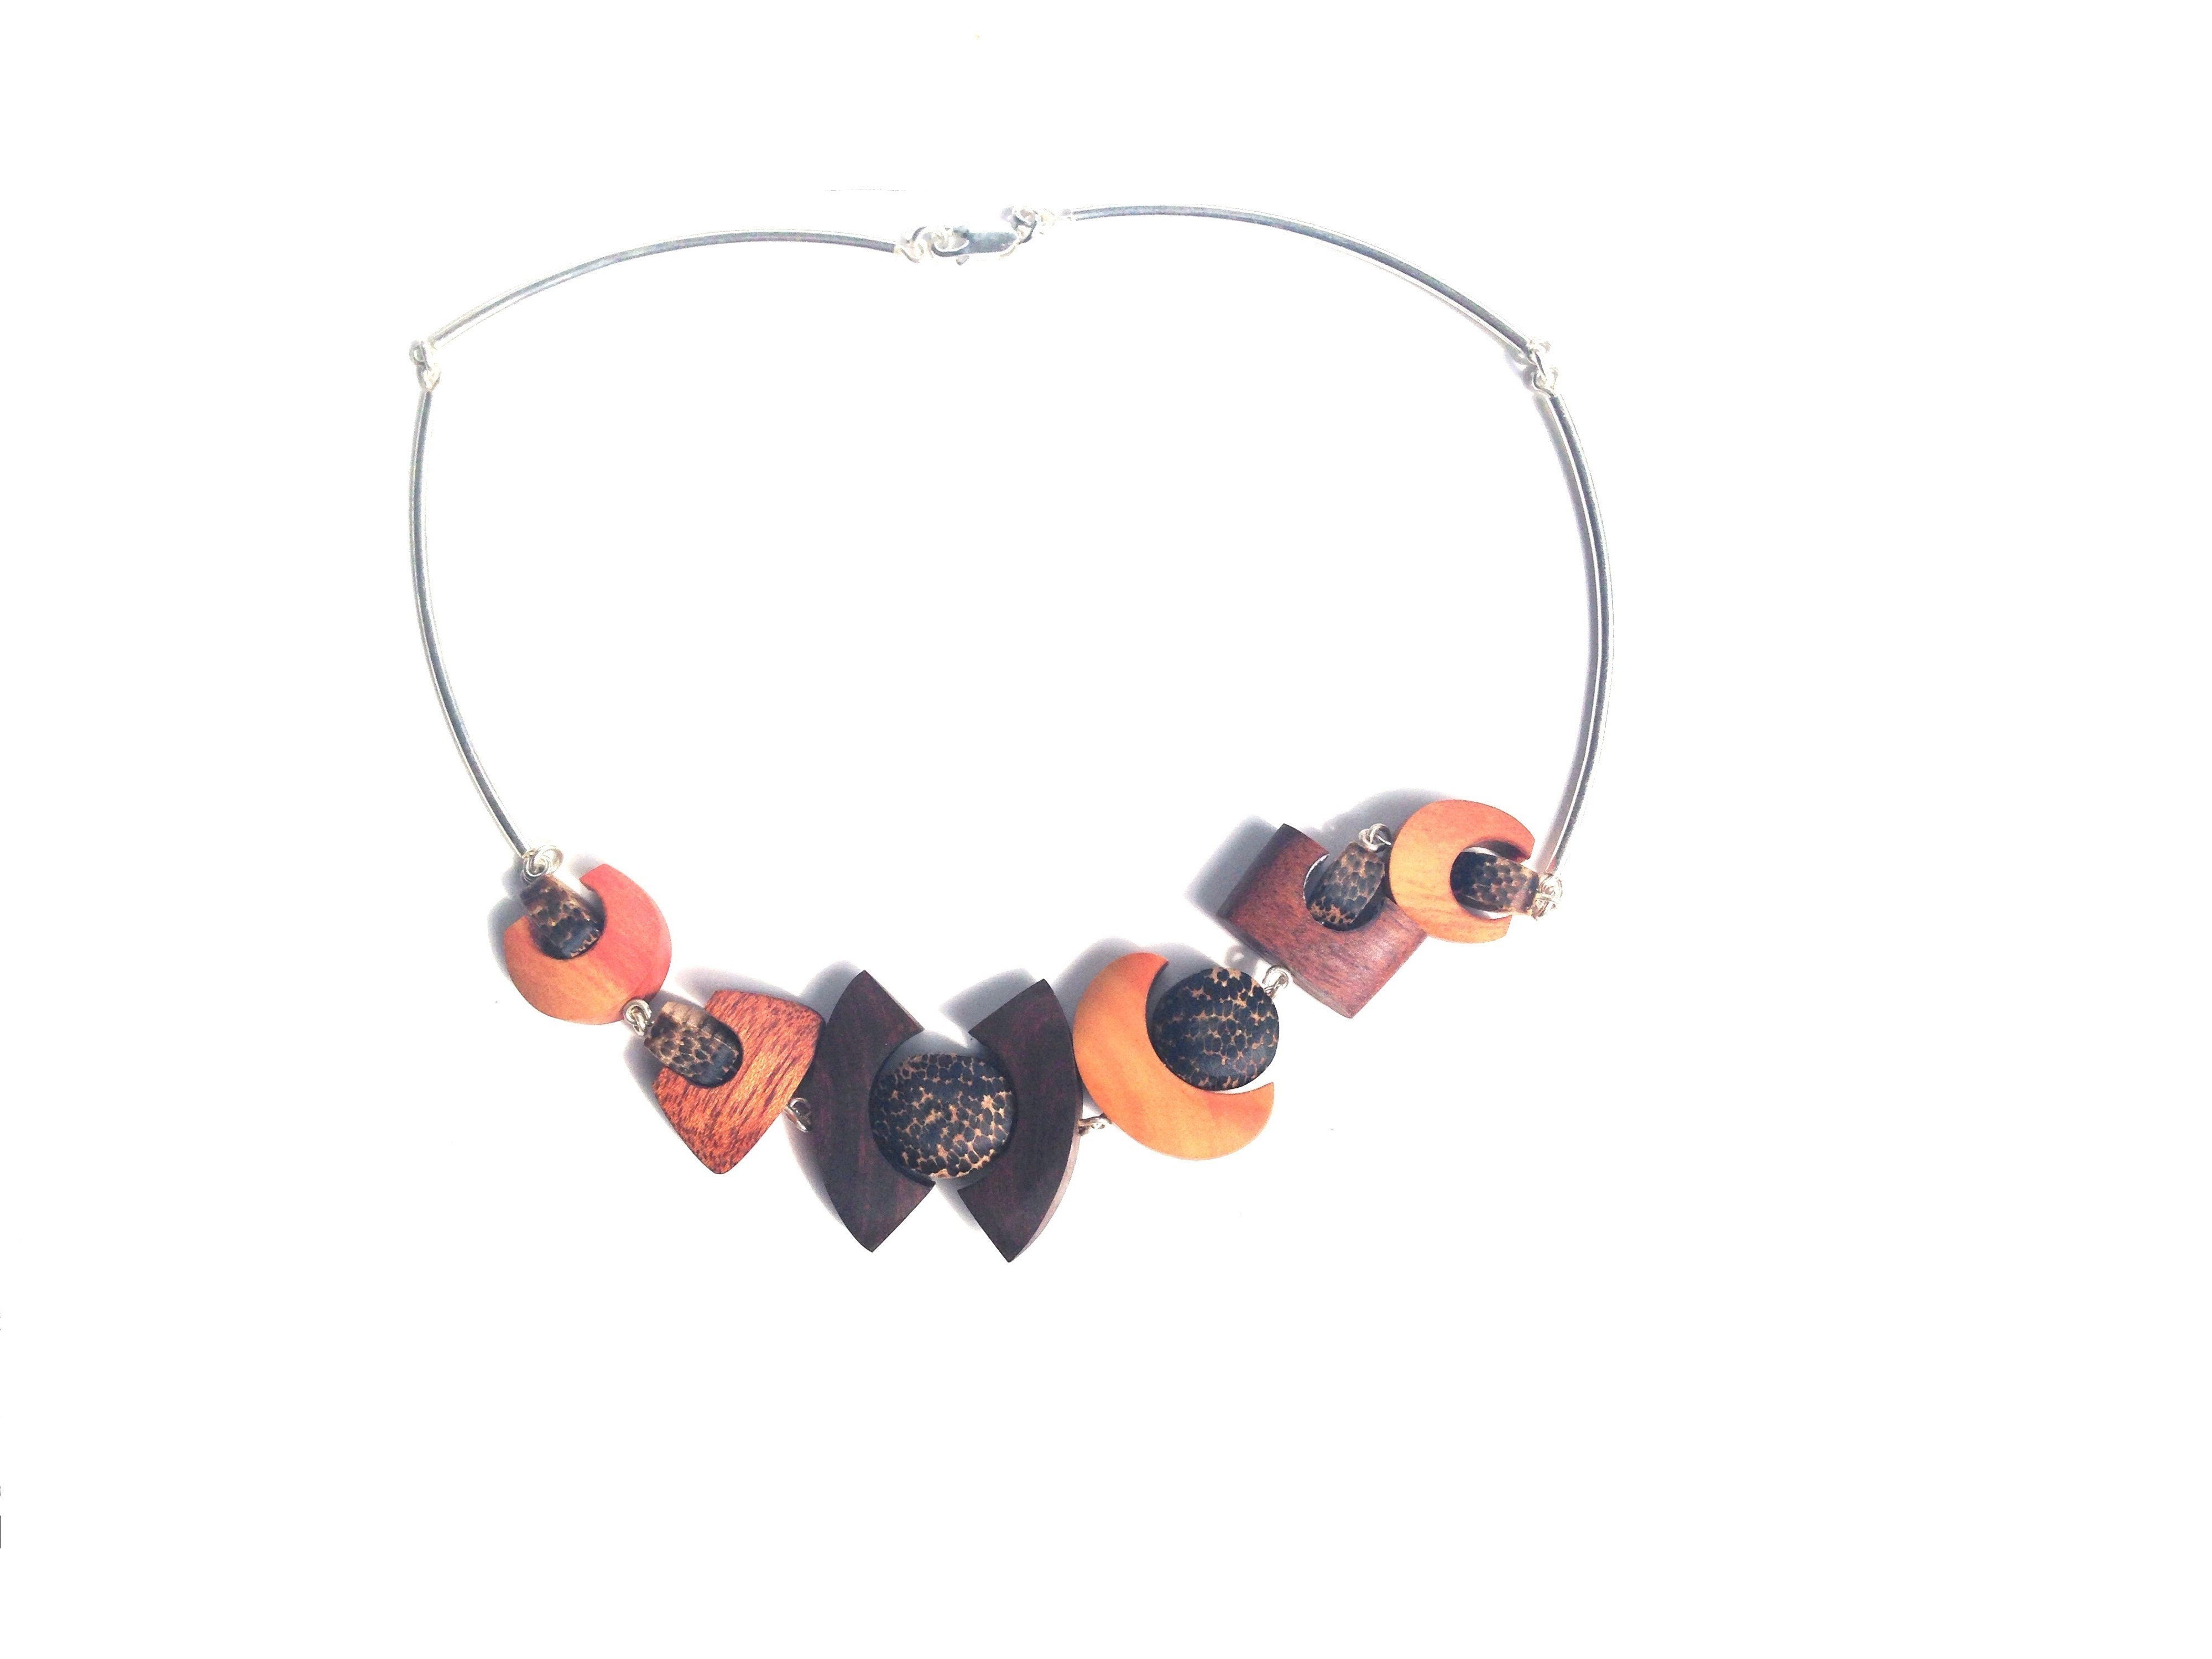 Asymmetric Necklace